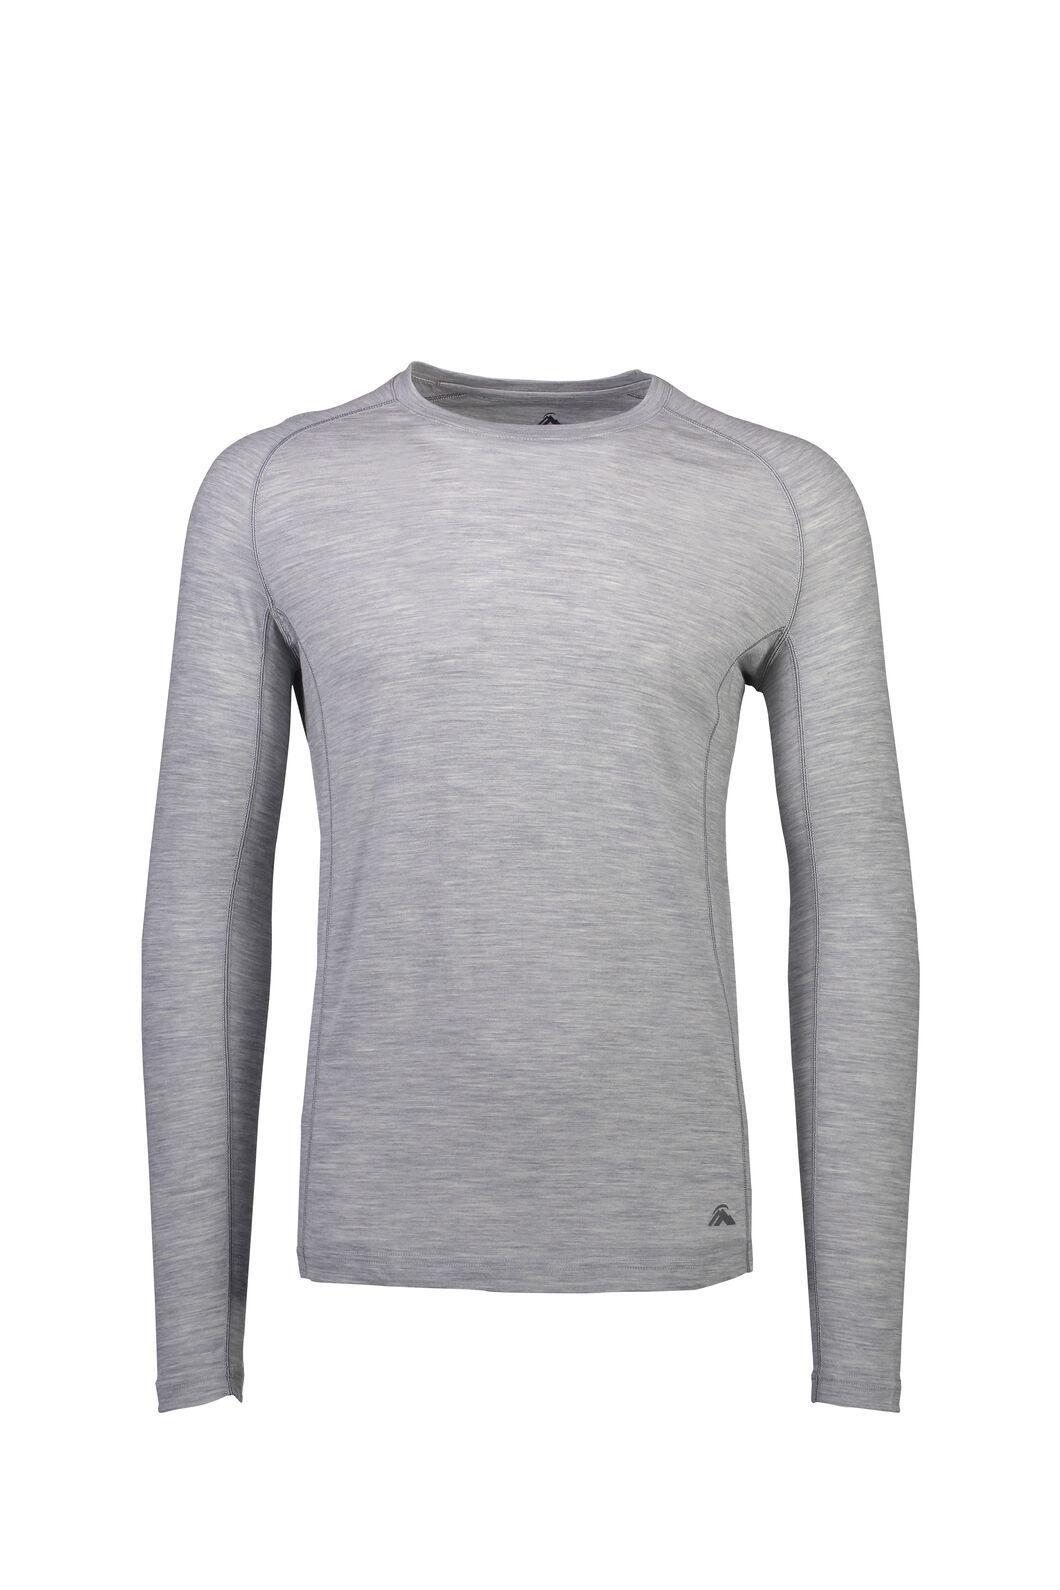 Macpac 150 Merino Long Sleeve Top — Men's, Light Grey Marle, hi-res